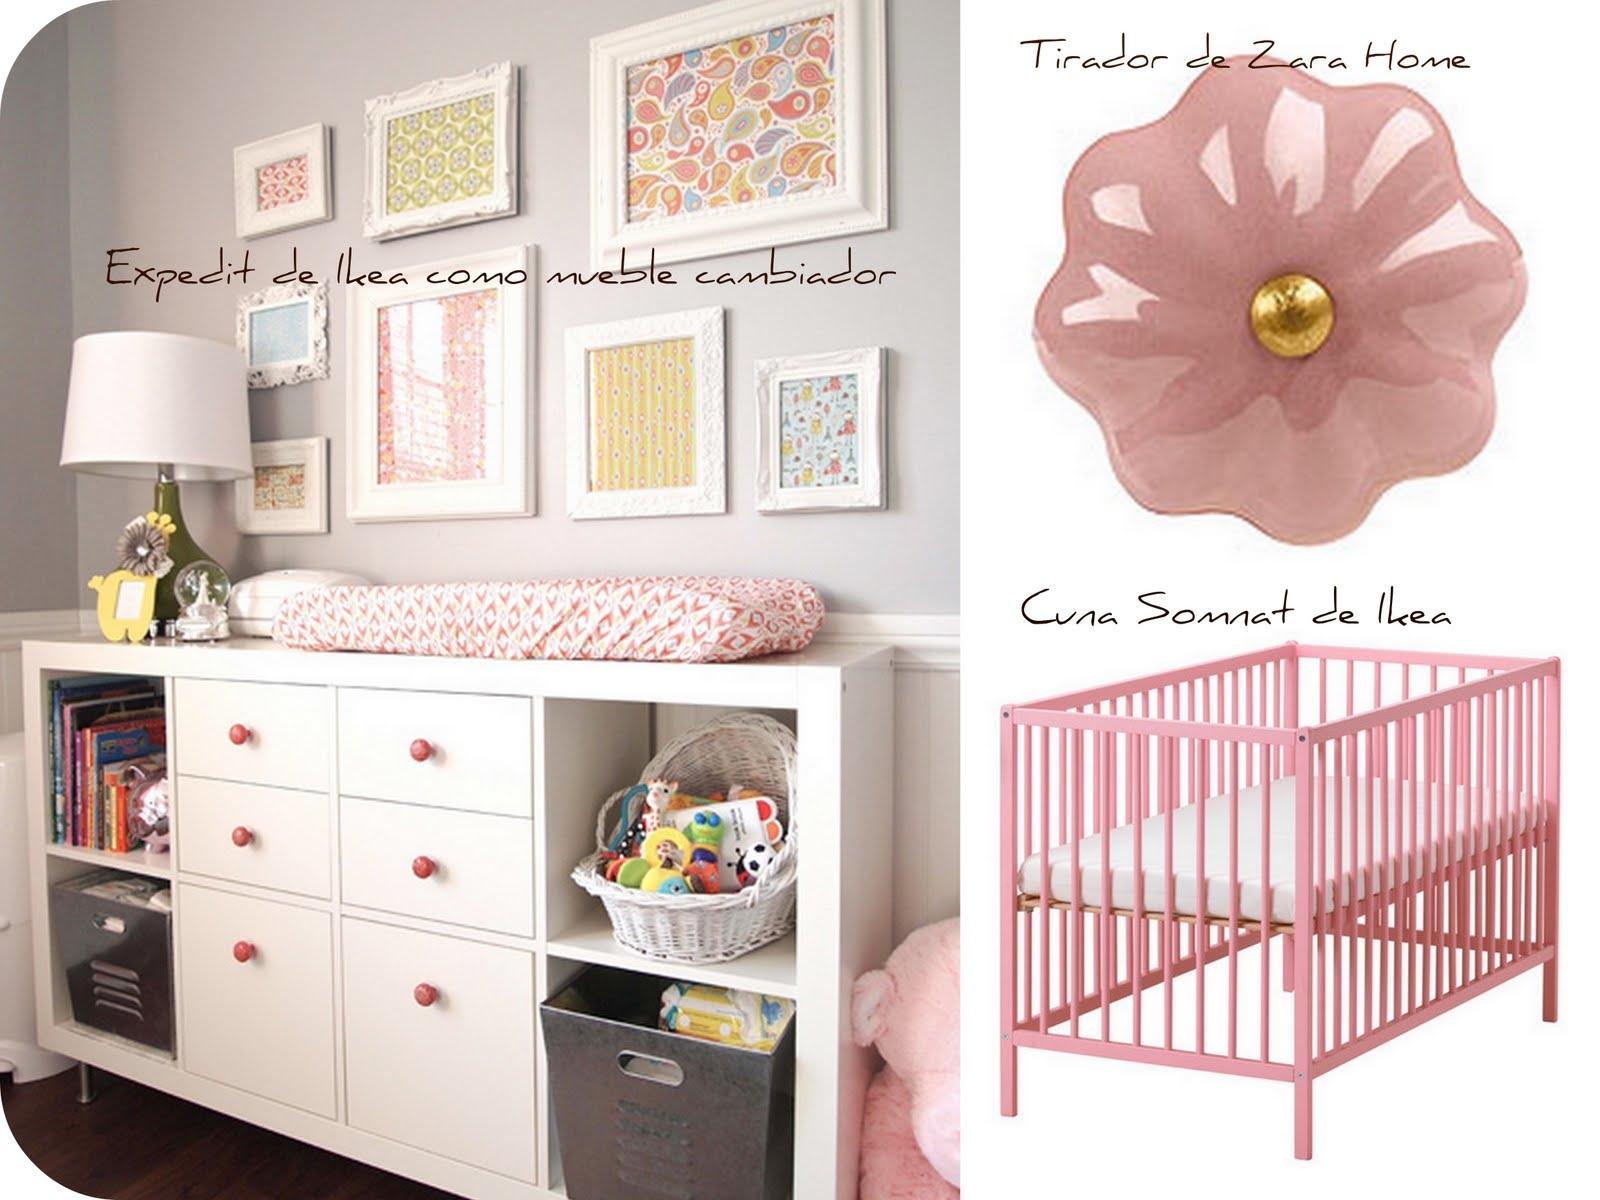 Ikea Baby Kast : Ikea baby kast gallery of delicat canape relax electrique ikea